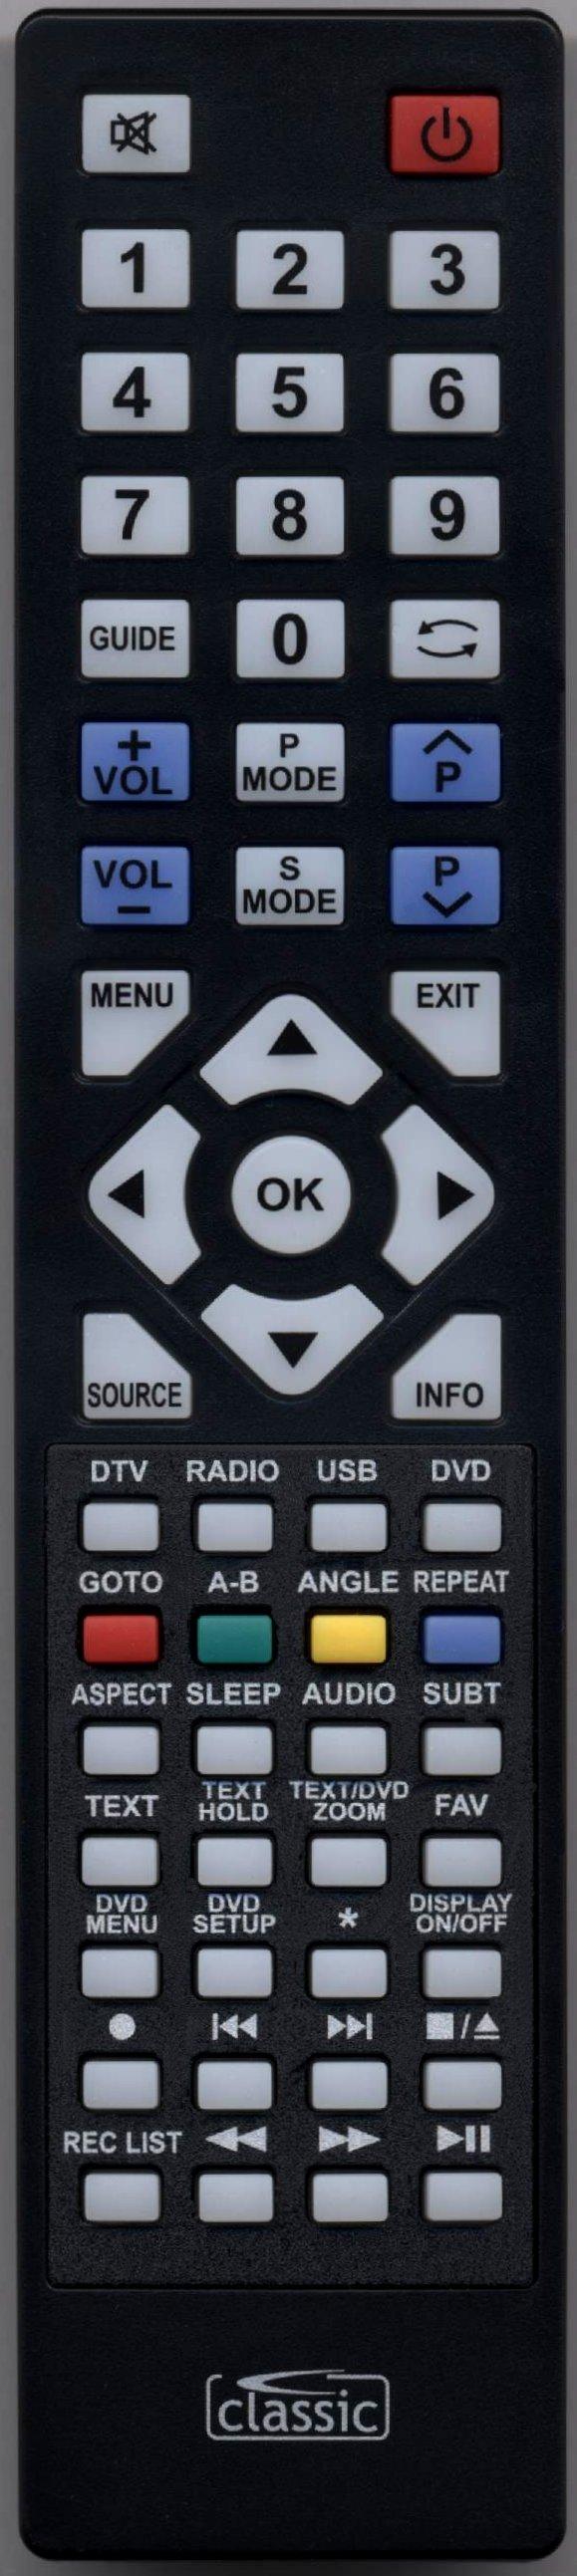 Blaupunkt 32141IGBFHBKEU Remote Control